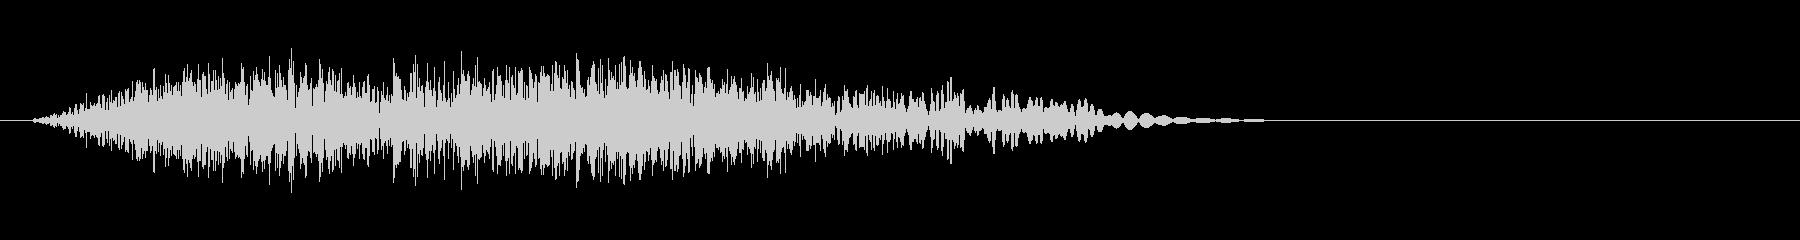 DJスクラッチ09_ワンショット04の未再生の波形